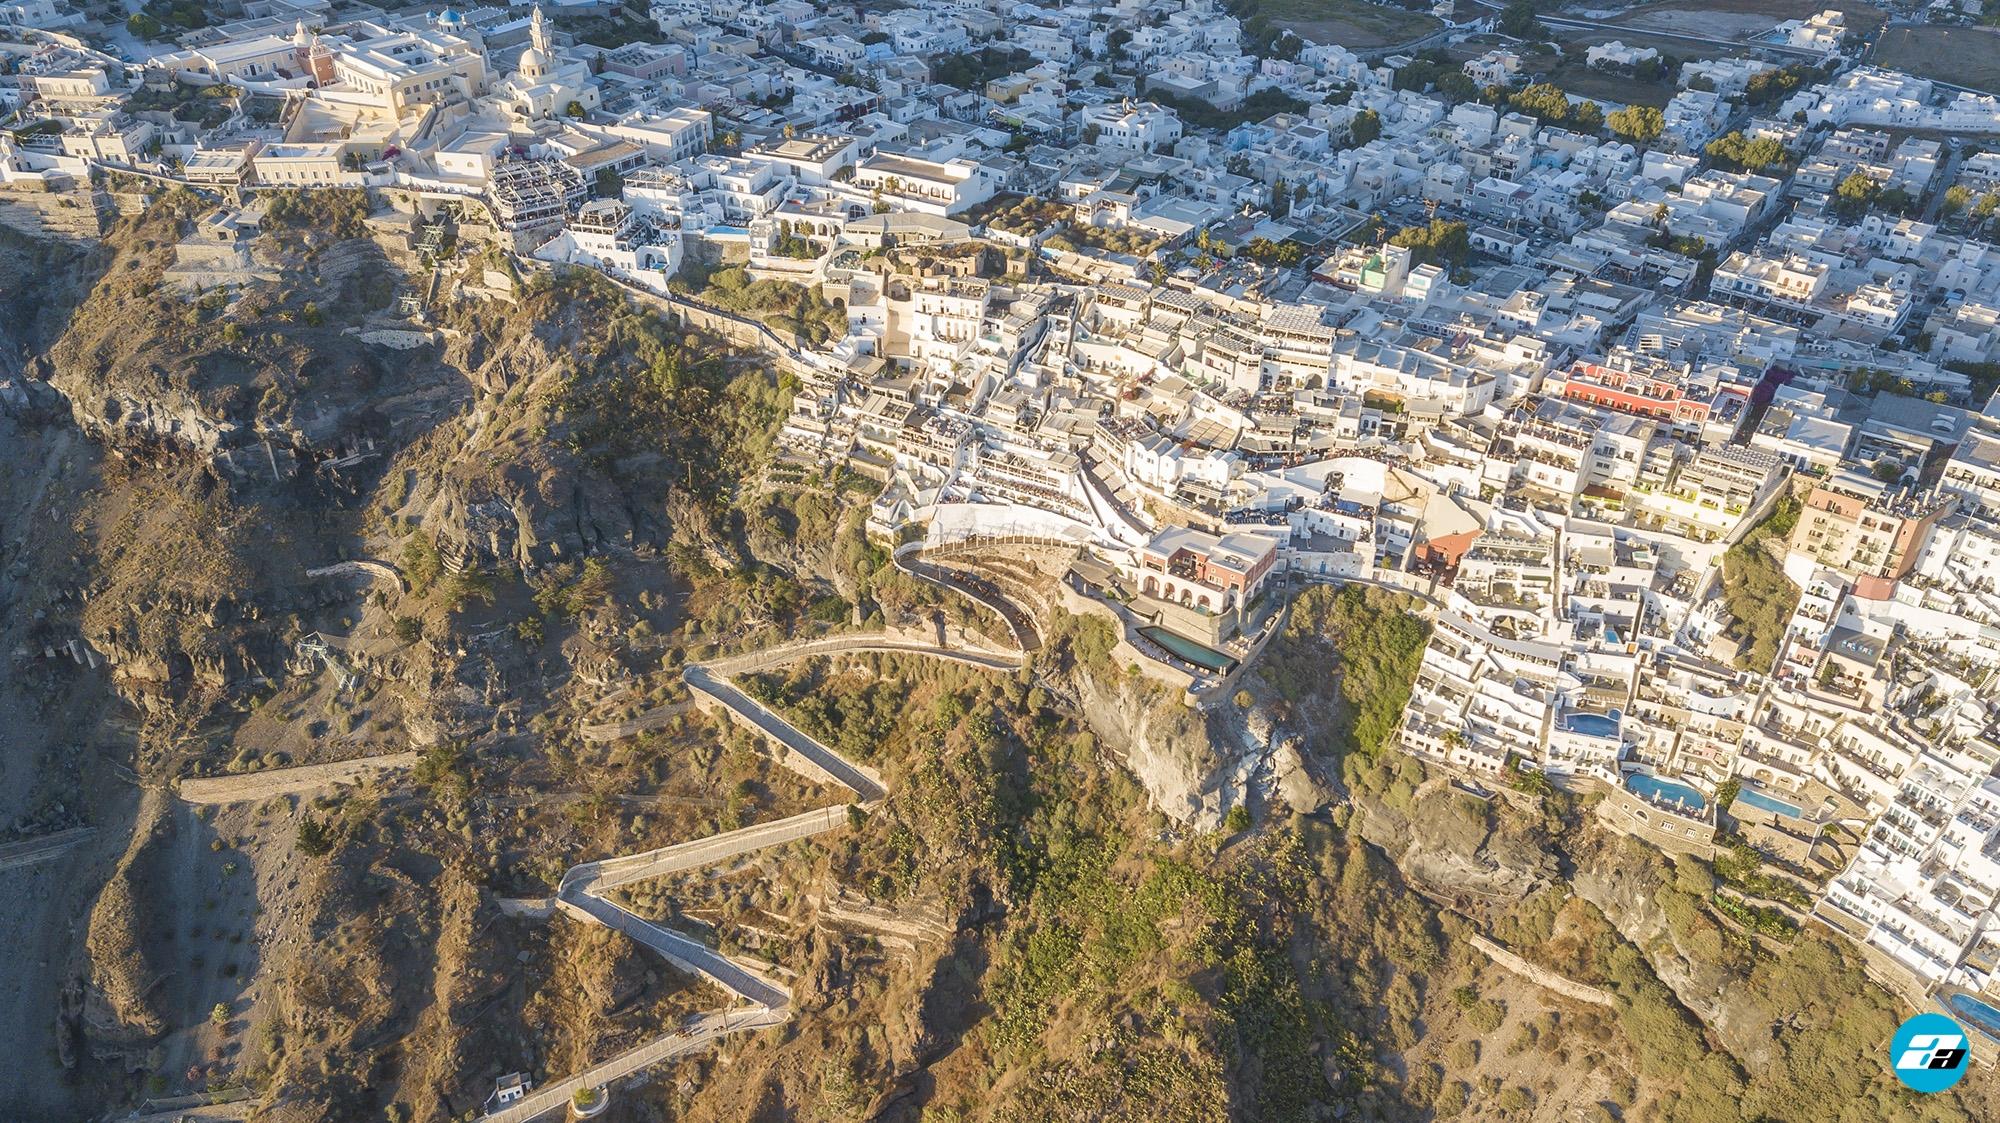 Fira, Santorini Greece. Santorini Capital. Fire from above. Aerial Photo